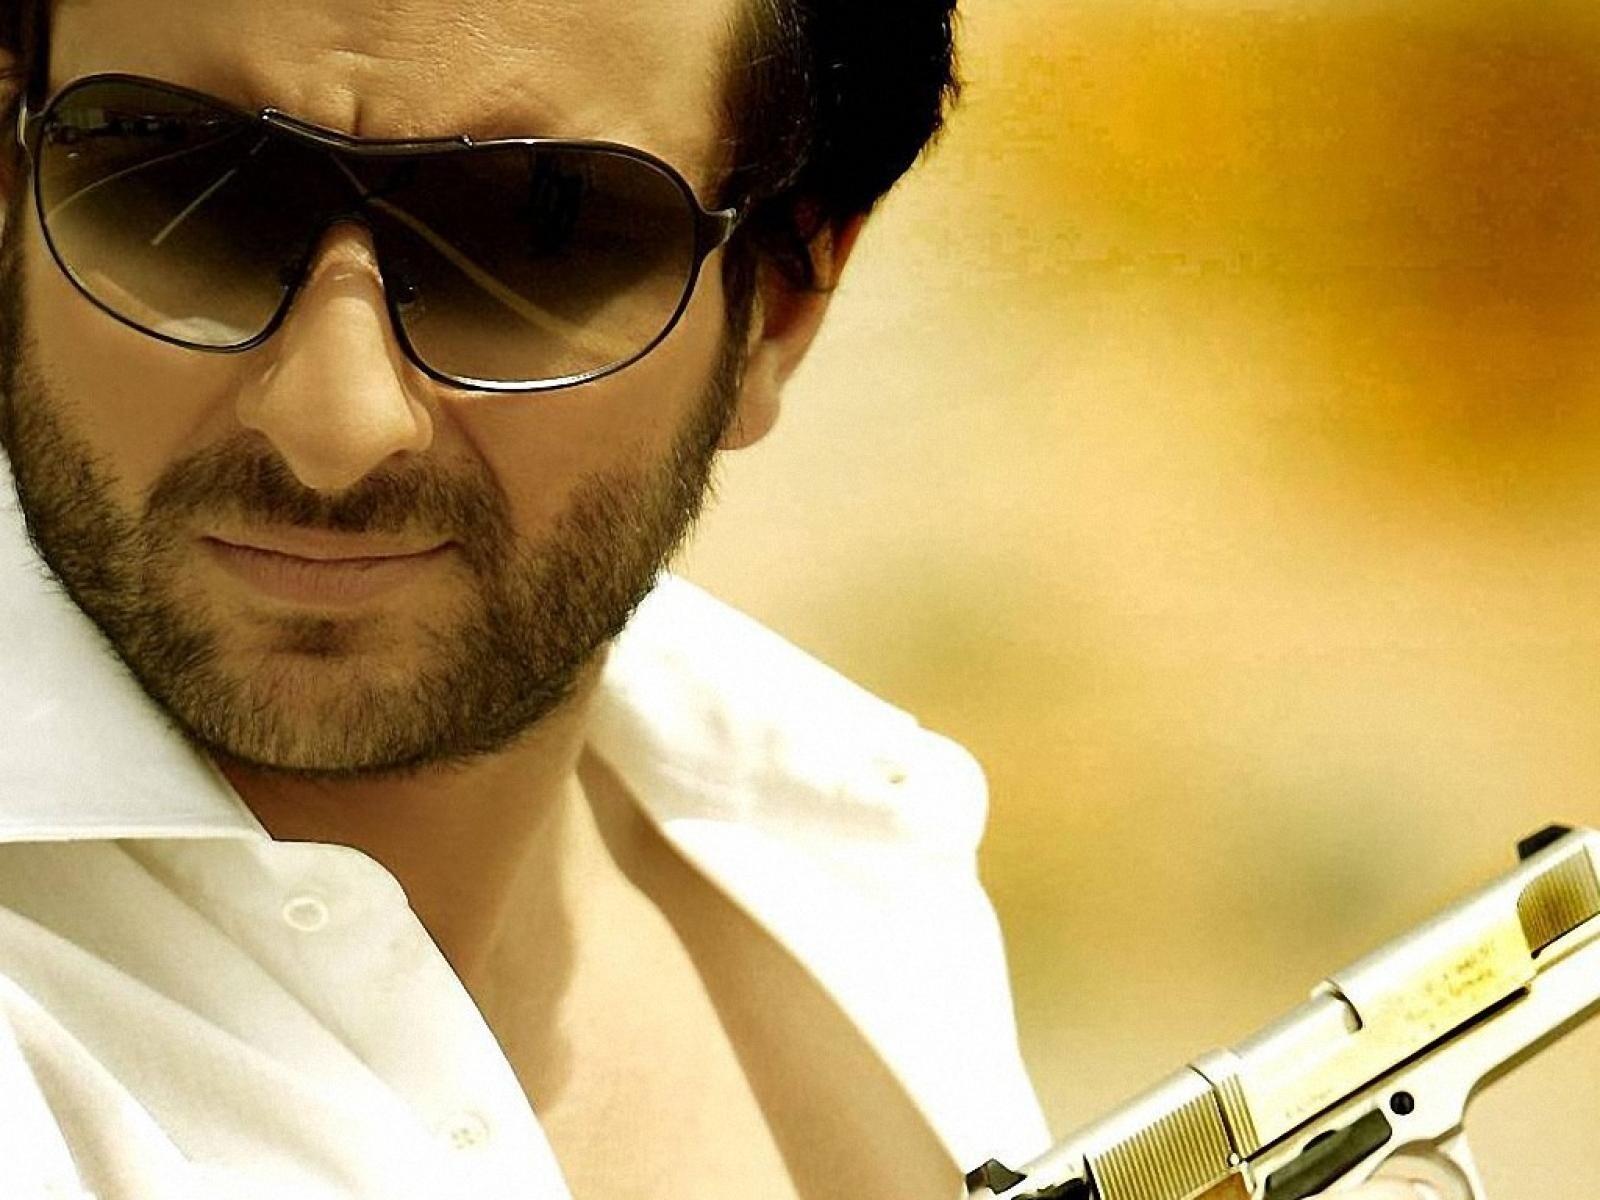 Download new hd photo of emraan hashmi bollywood actor wallpaper.